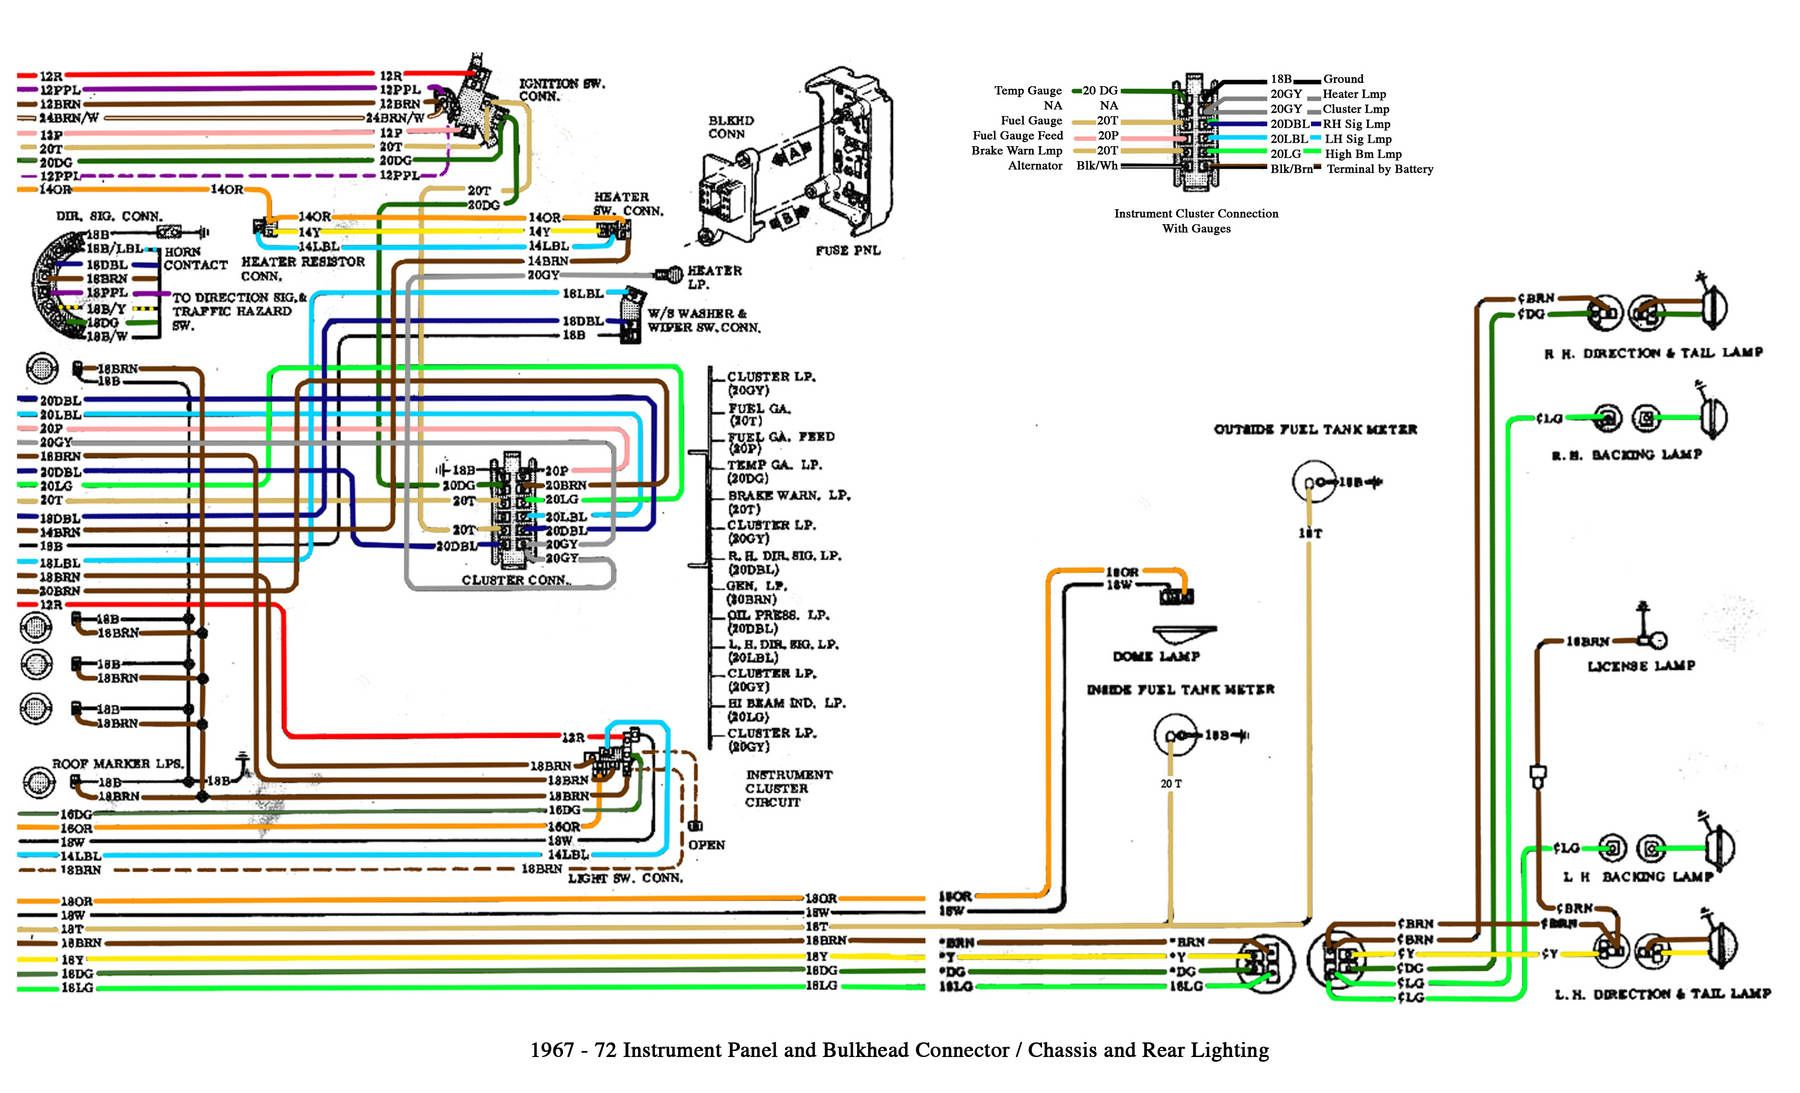 wiring diagram | Bryan's old truck | Chevy trucks, Chevy ...